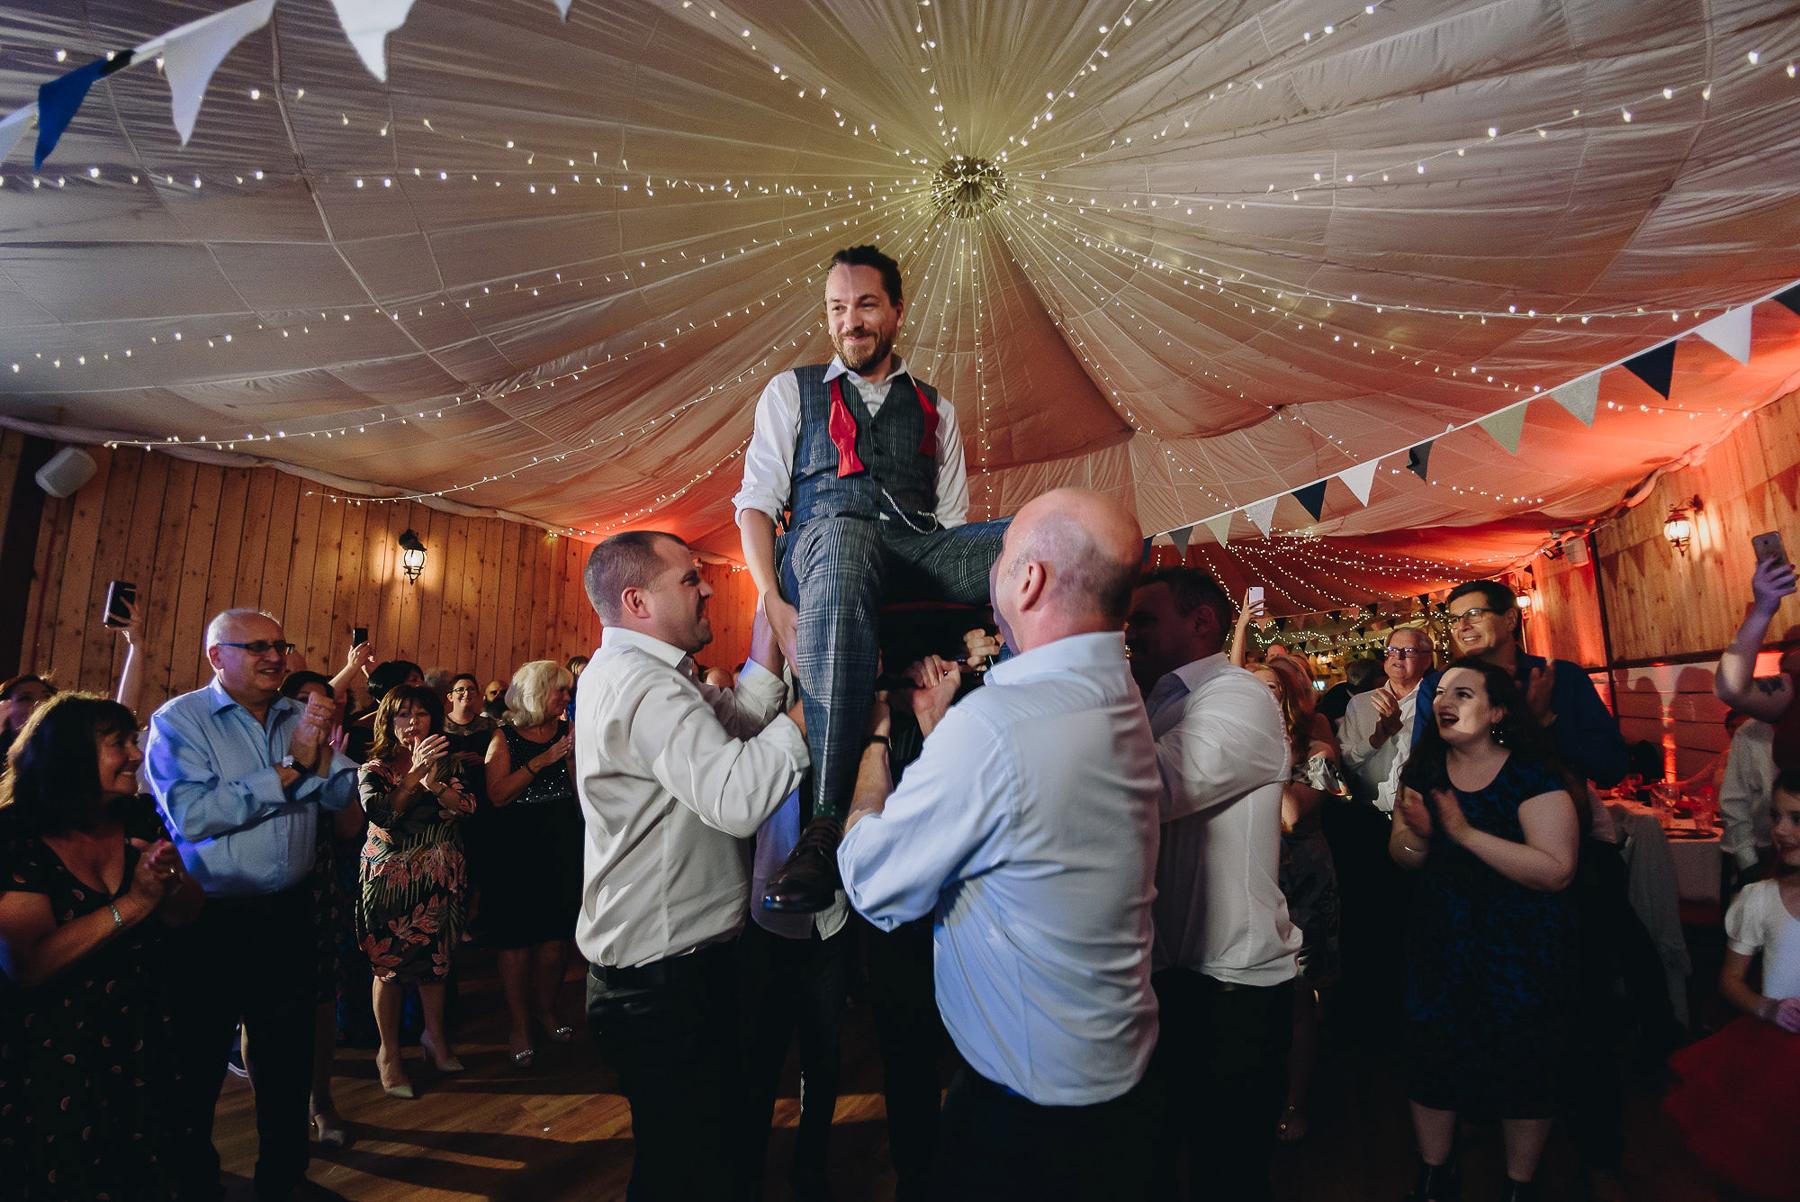 Wellbeing_Farm_Wedding_Photography_The_Pin-Up_Bride_Lara_Shaun-172.jpg